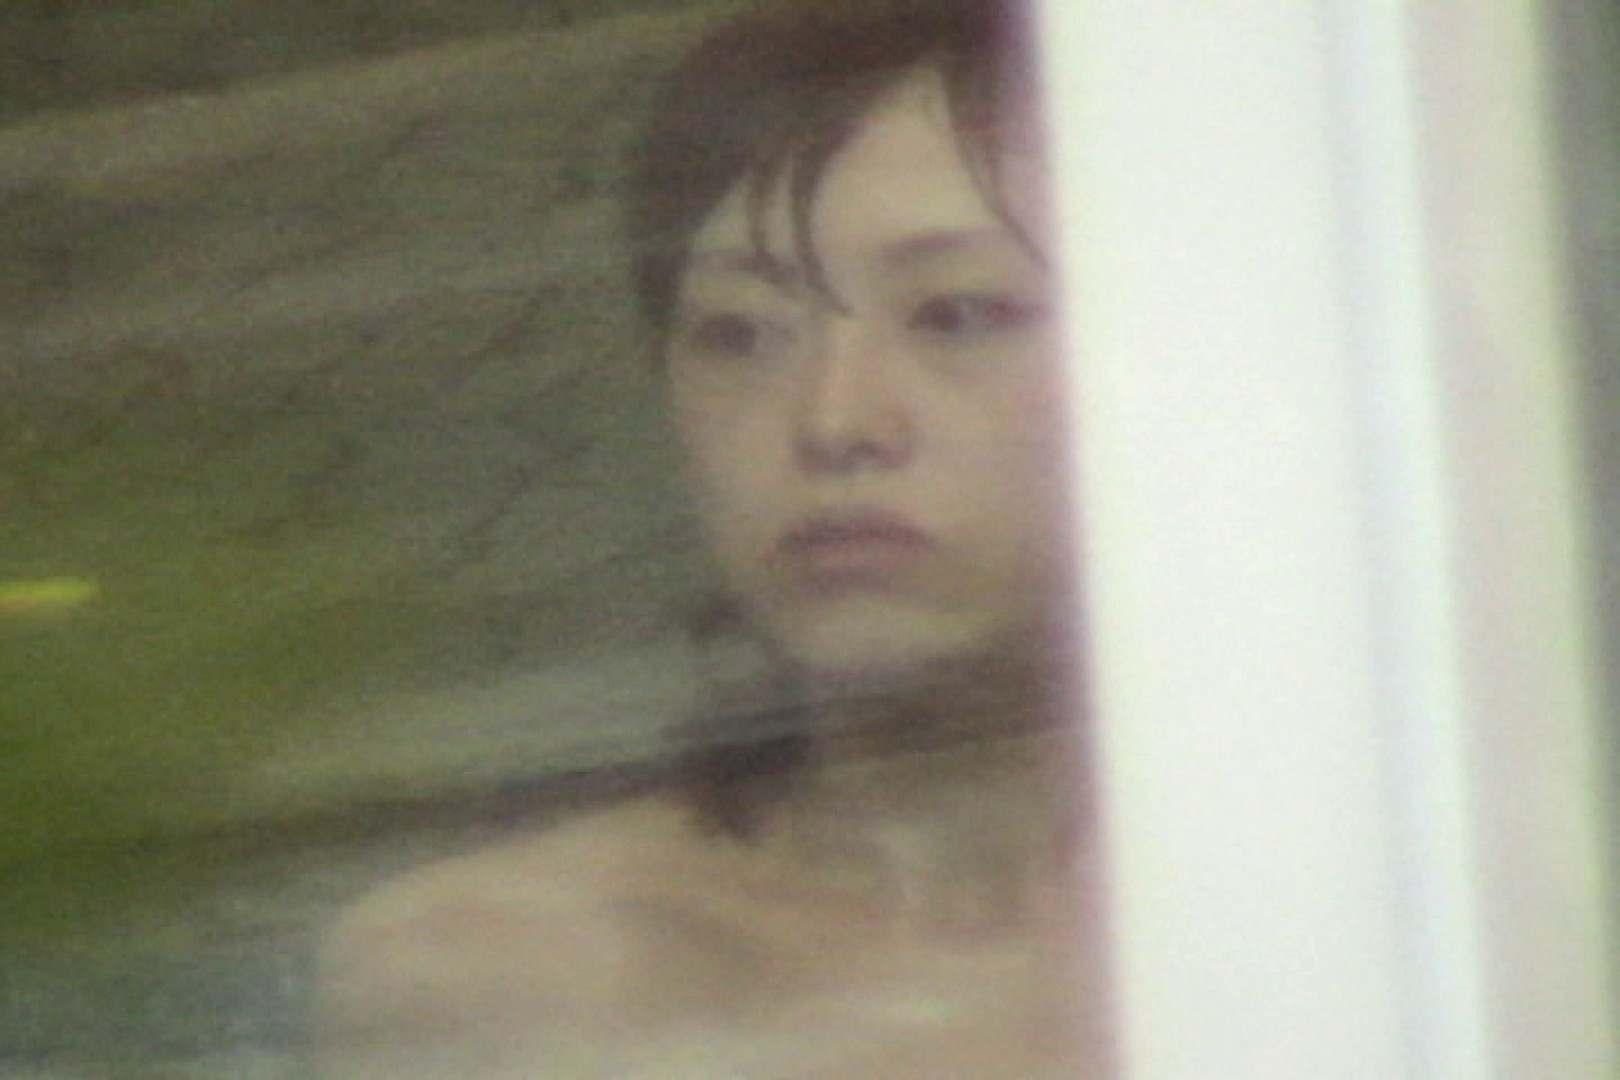 Aquaな露天風呂Vol.711 露天風呂突入 おまんこ無修正動画無料 97pic 83